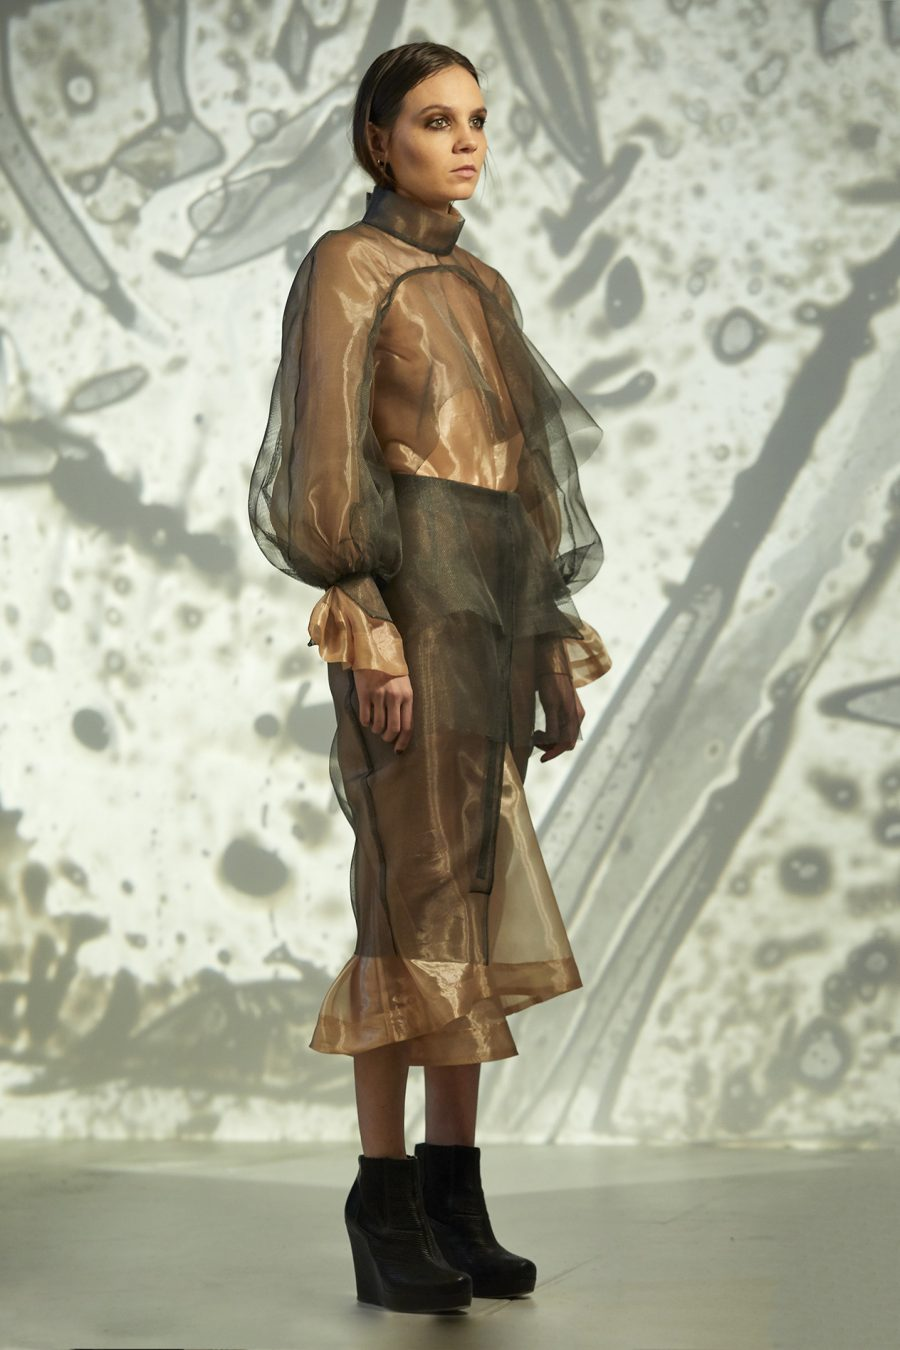 Norea Persdotter - 3